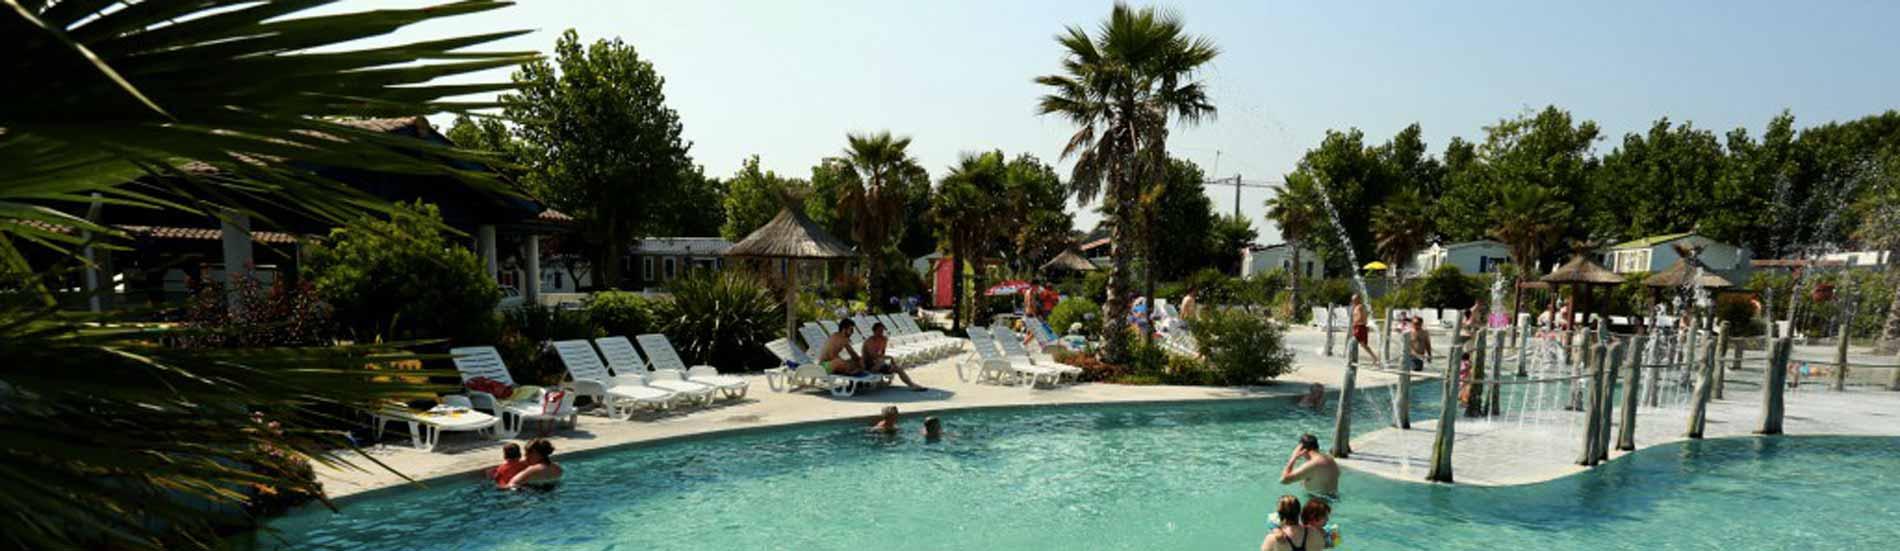 Camping Biarritz | Bidart | 4 Étoiles | Pays Basque ... encequiconcerne Camping Pays Basque Avec Piscine